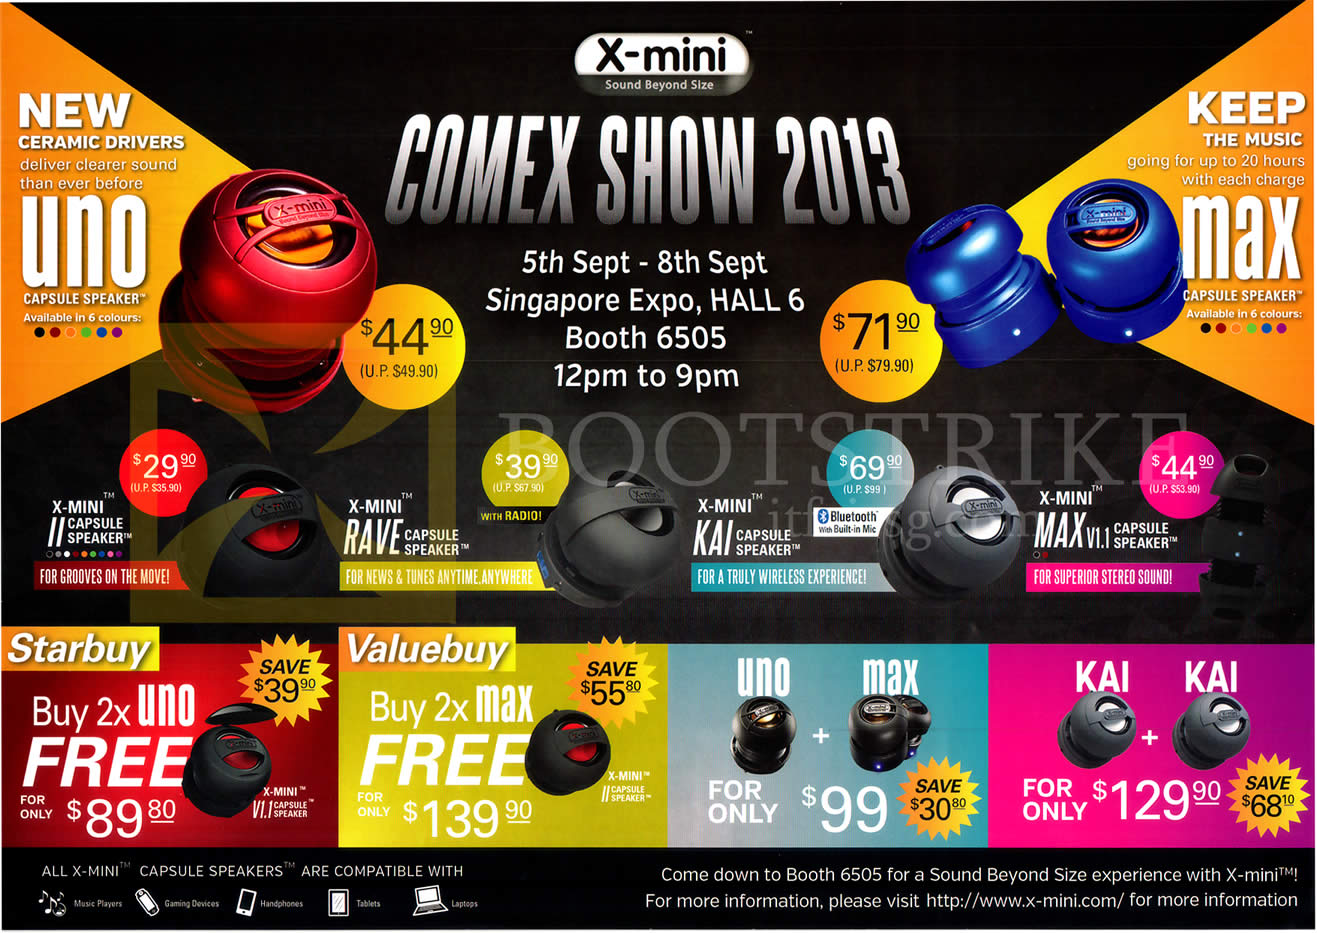 COMEX 2013 price list image brochure of Convergent X-Mini Speakers II Capsule, Rave, Kai, Max, Uno